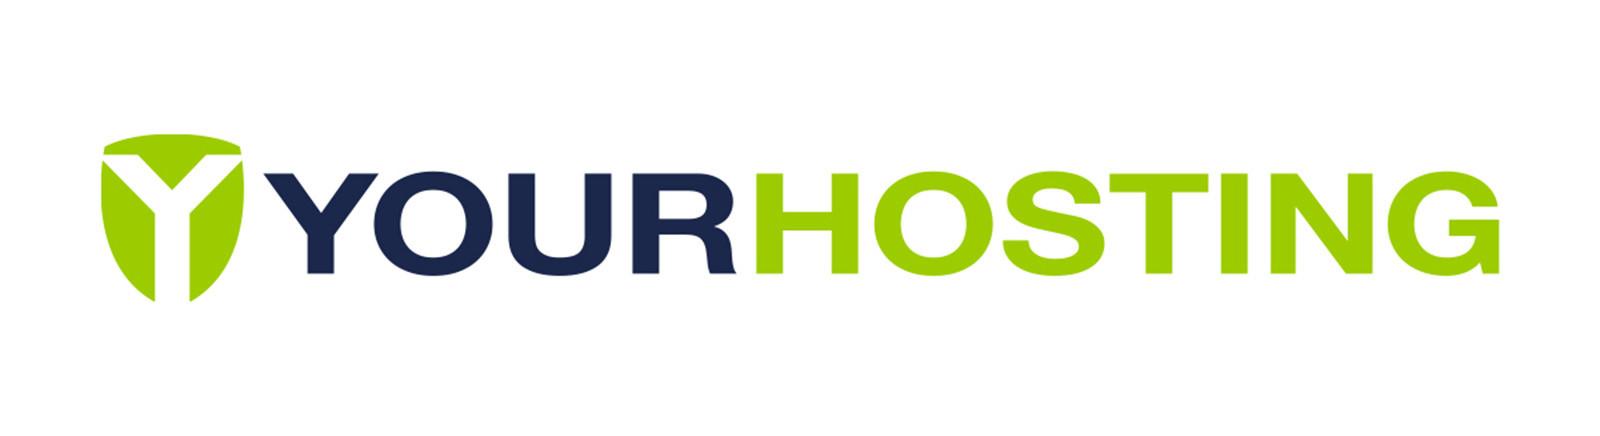 Yourhosting.nl